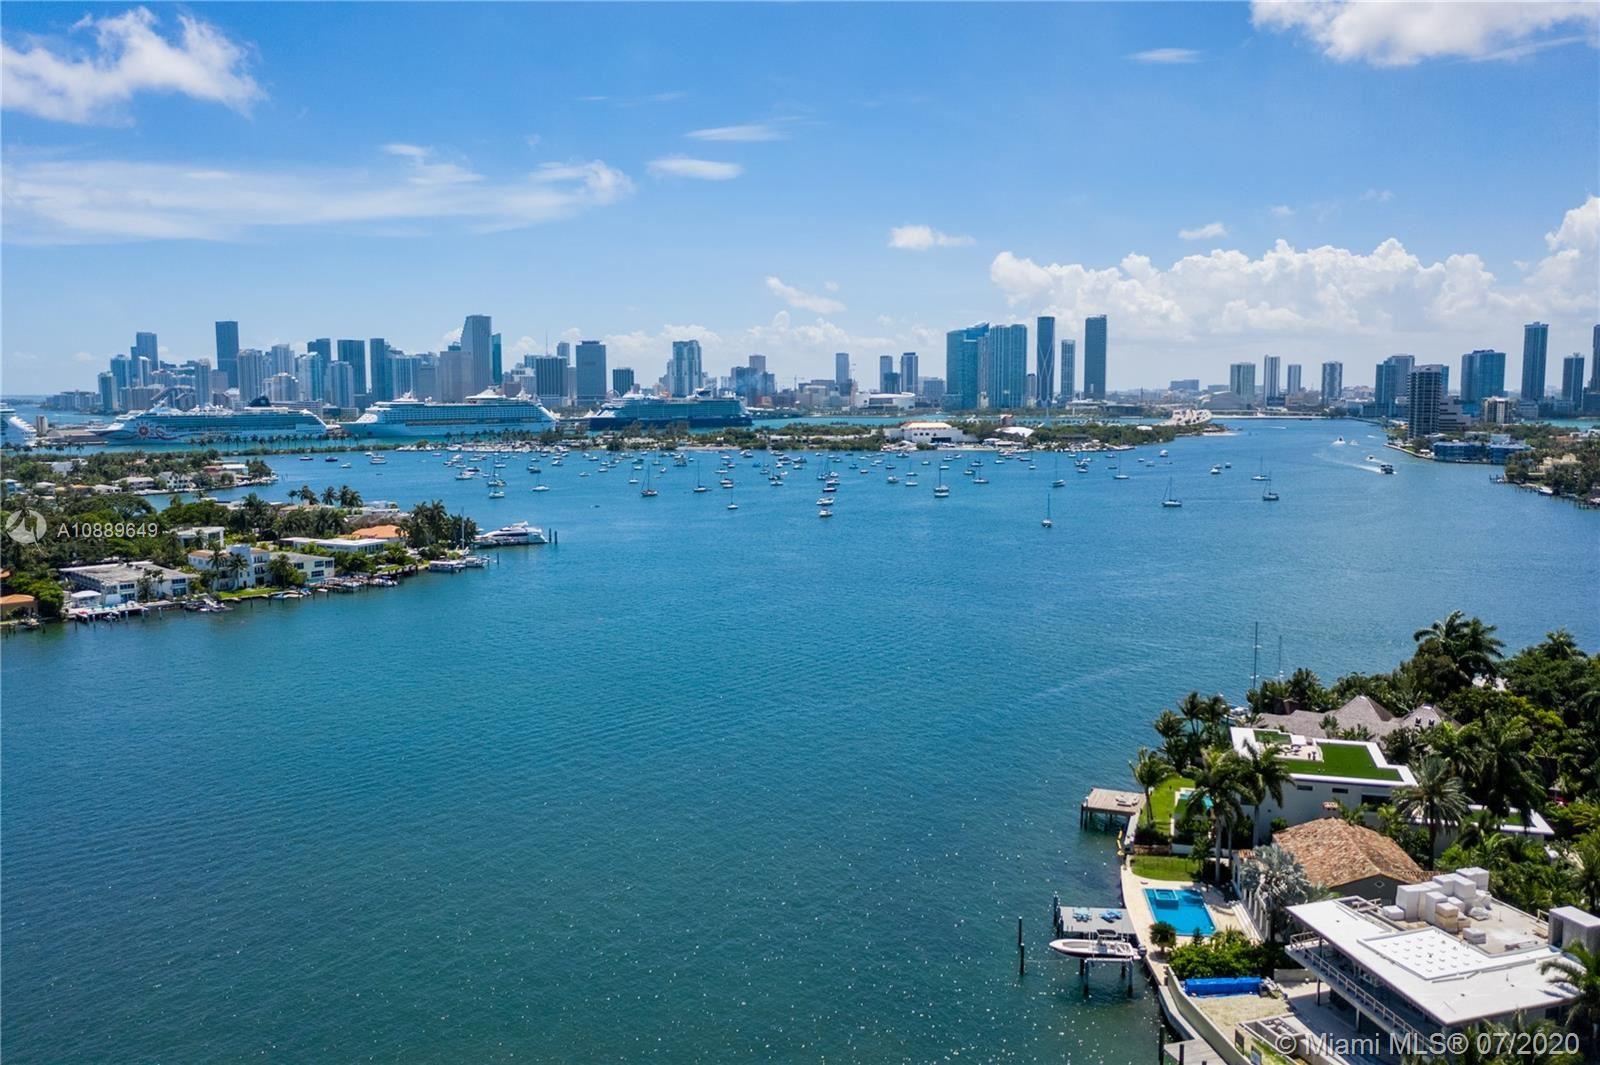 Photo 70 of Listing MLS a10889649 in 10 W San Marino Dr Miami Beach FL 33139